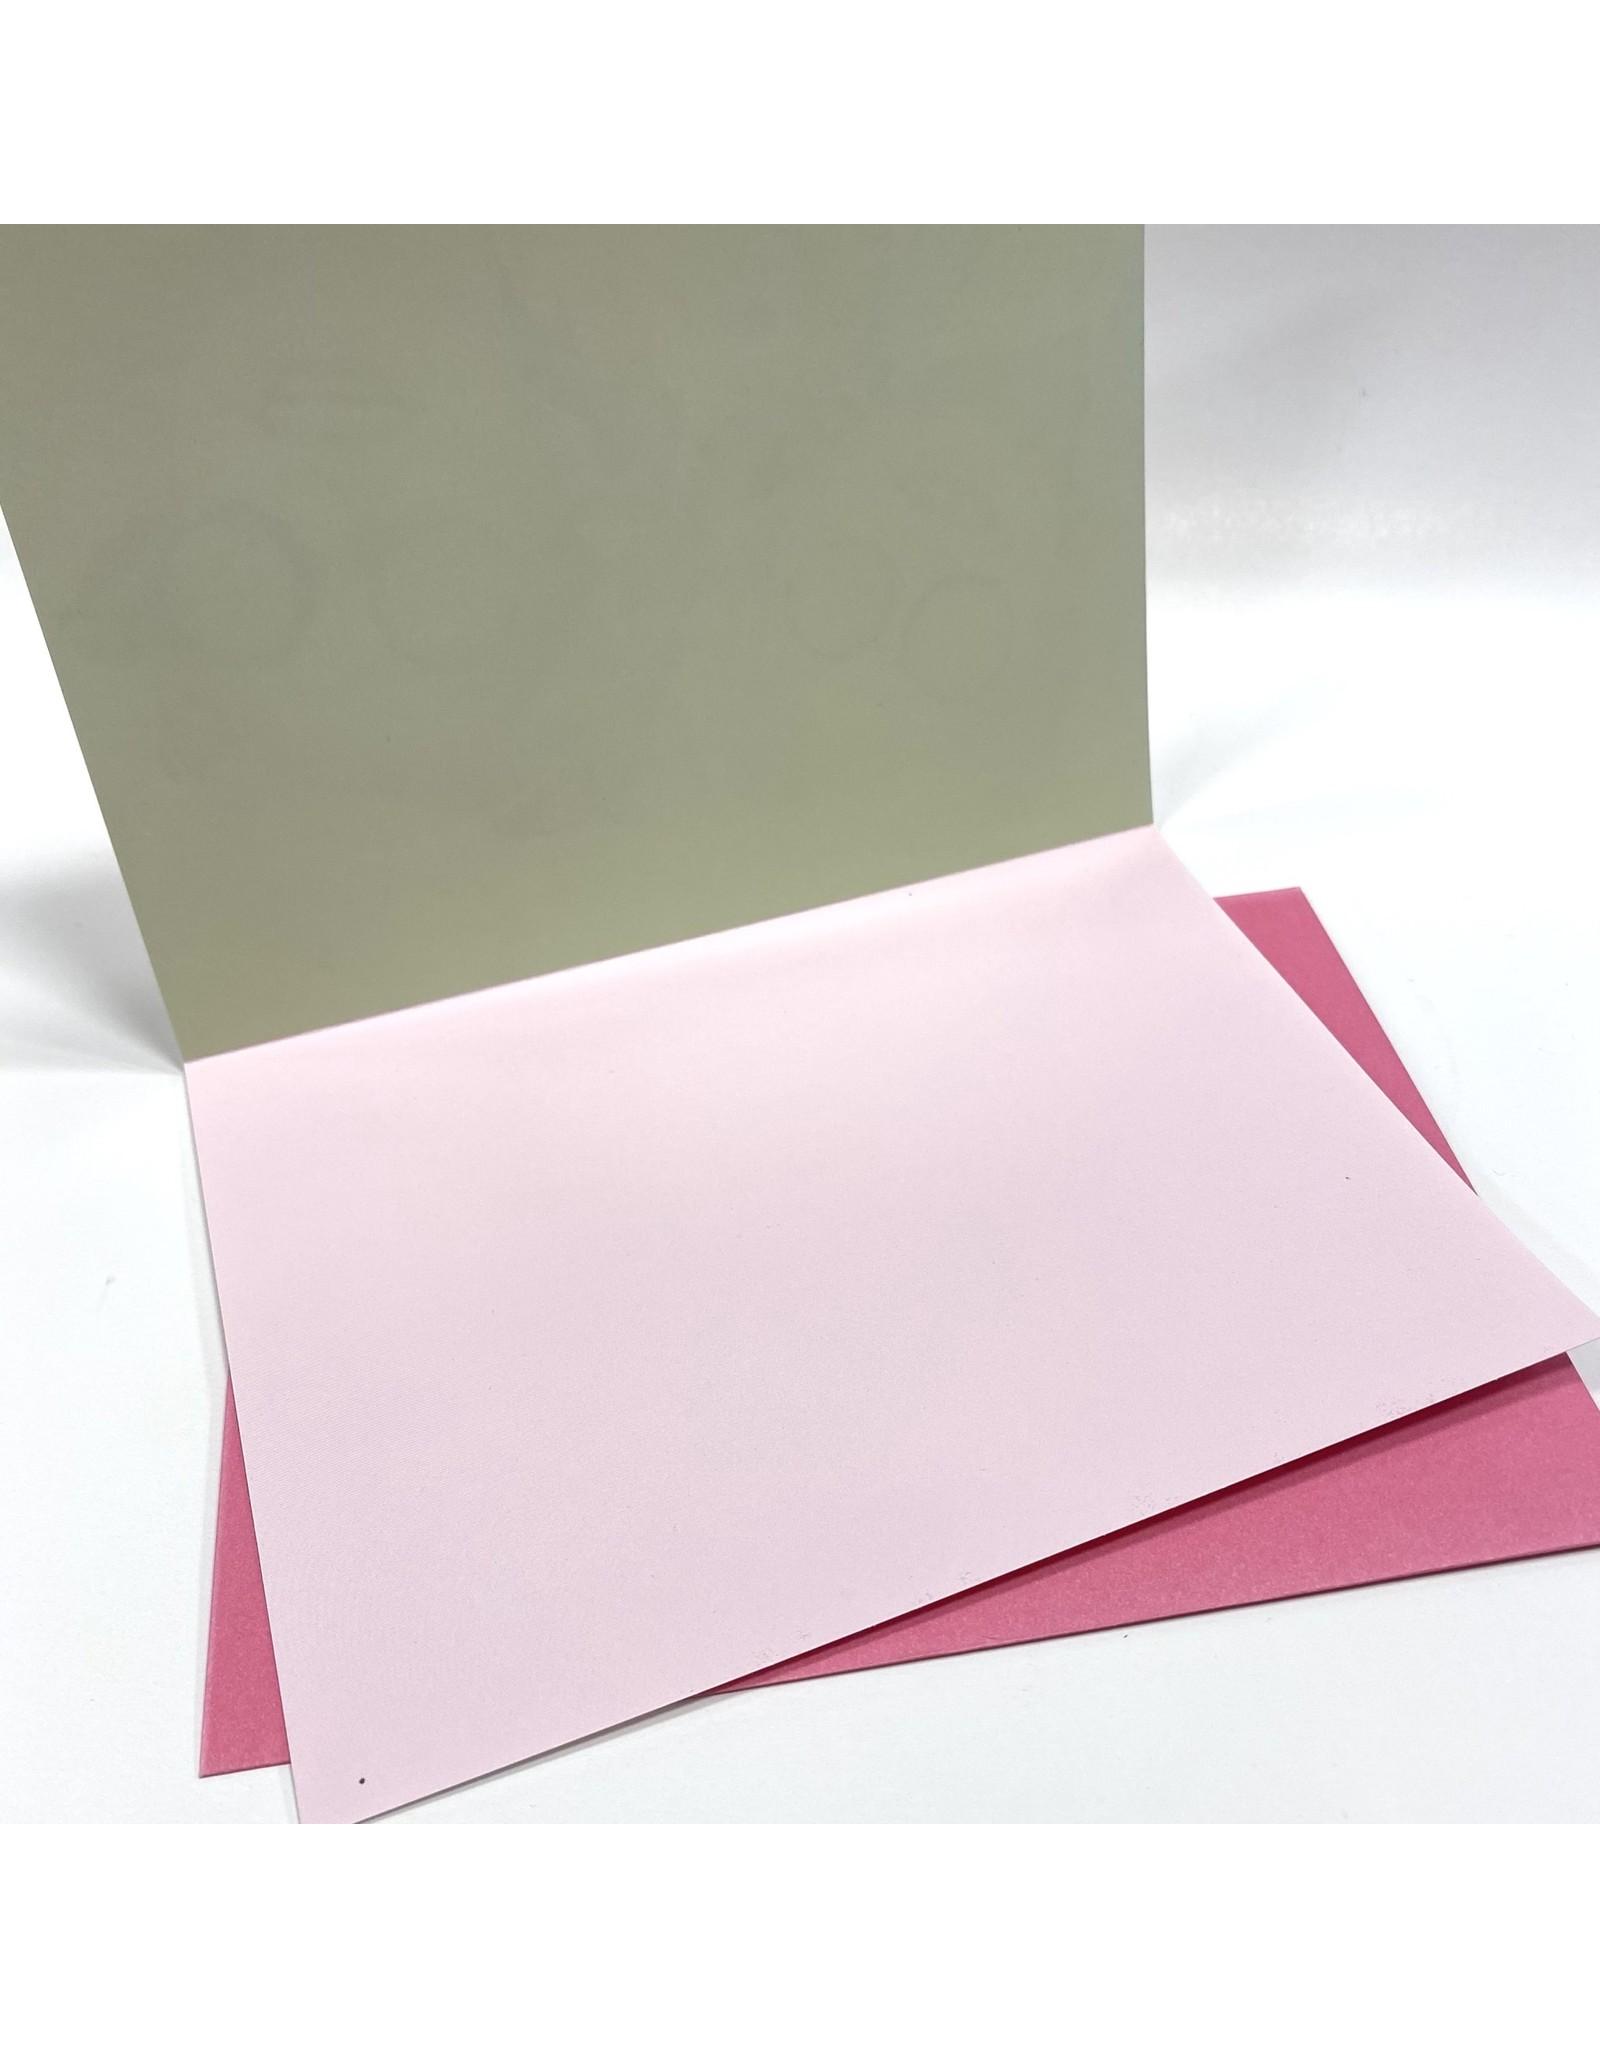 Design Design Greeting Card - Blank